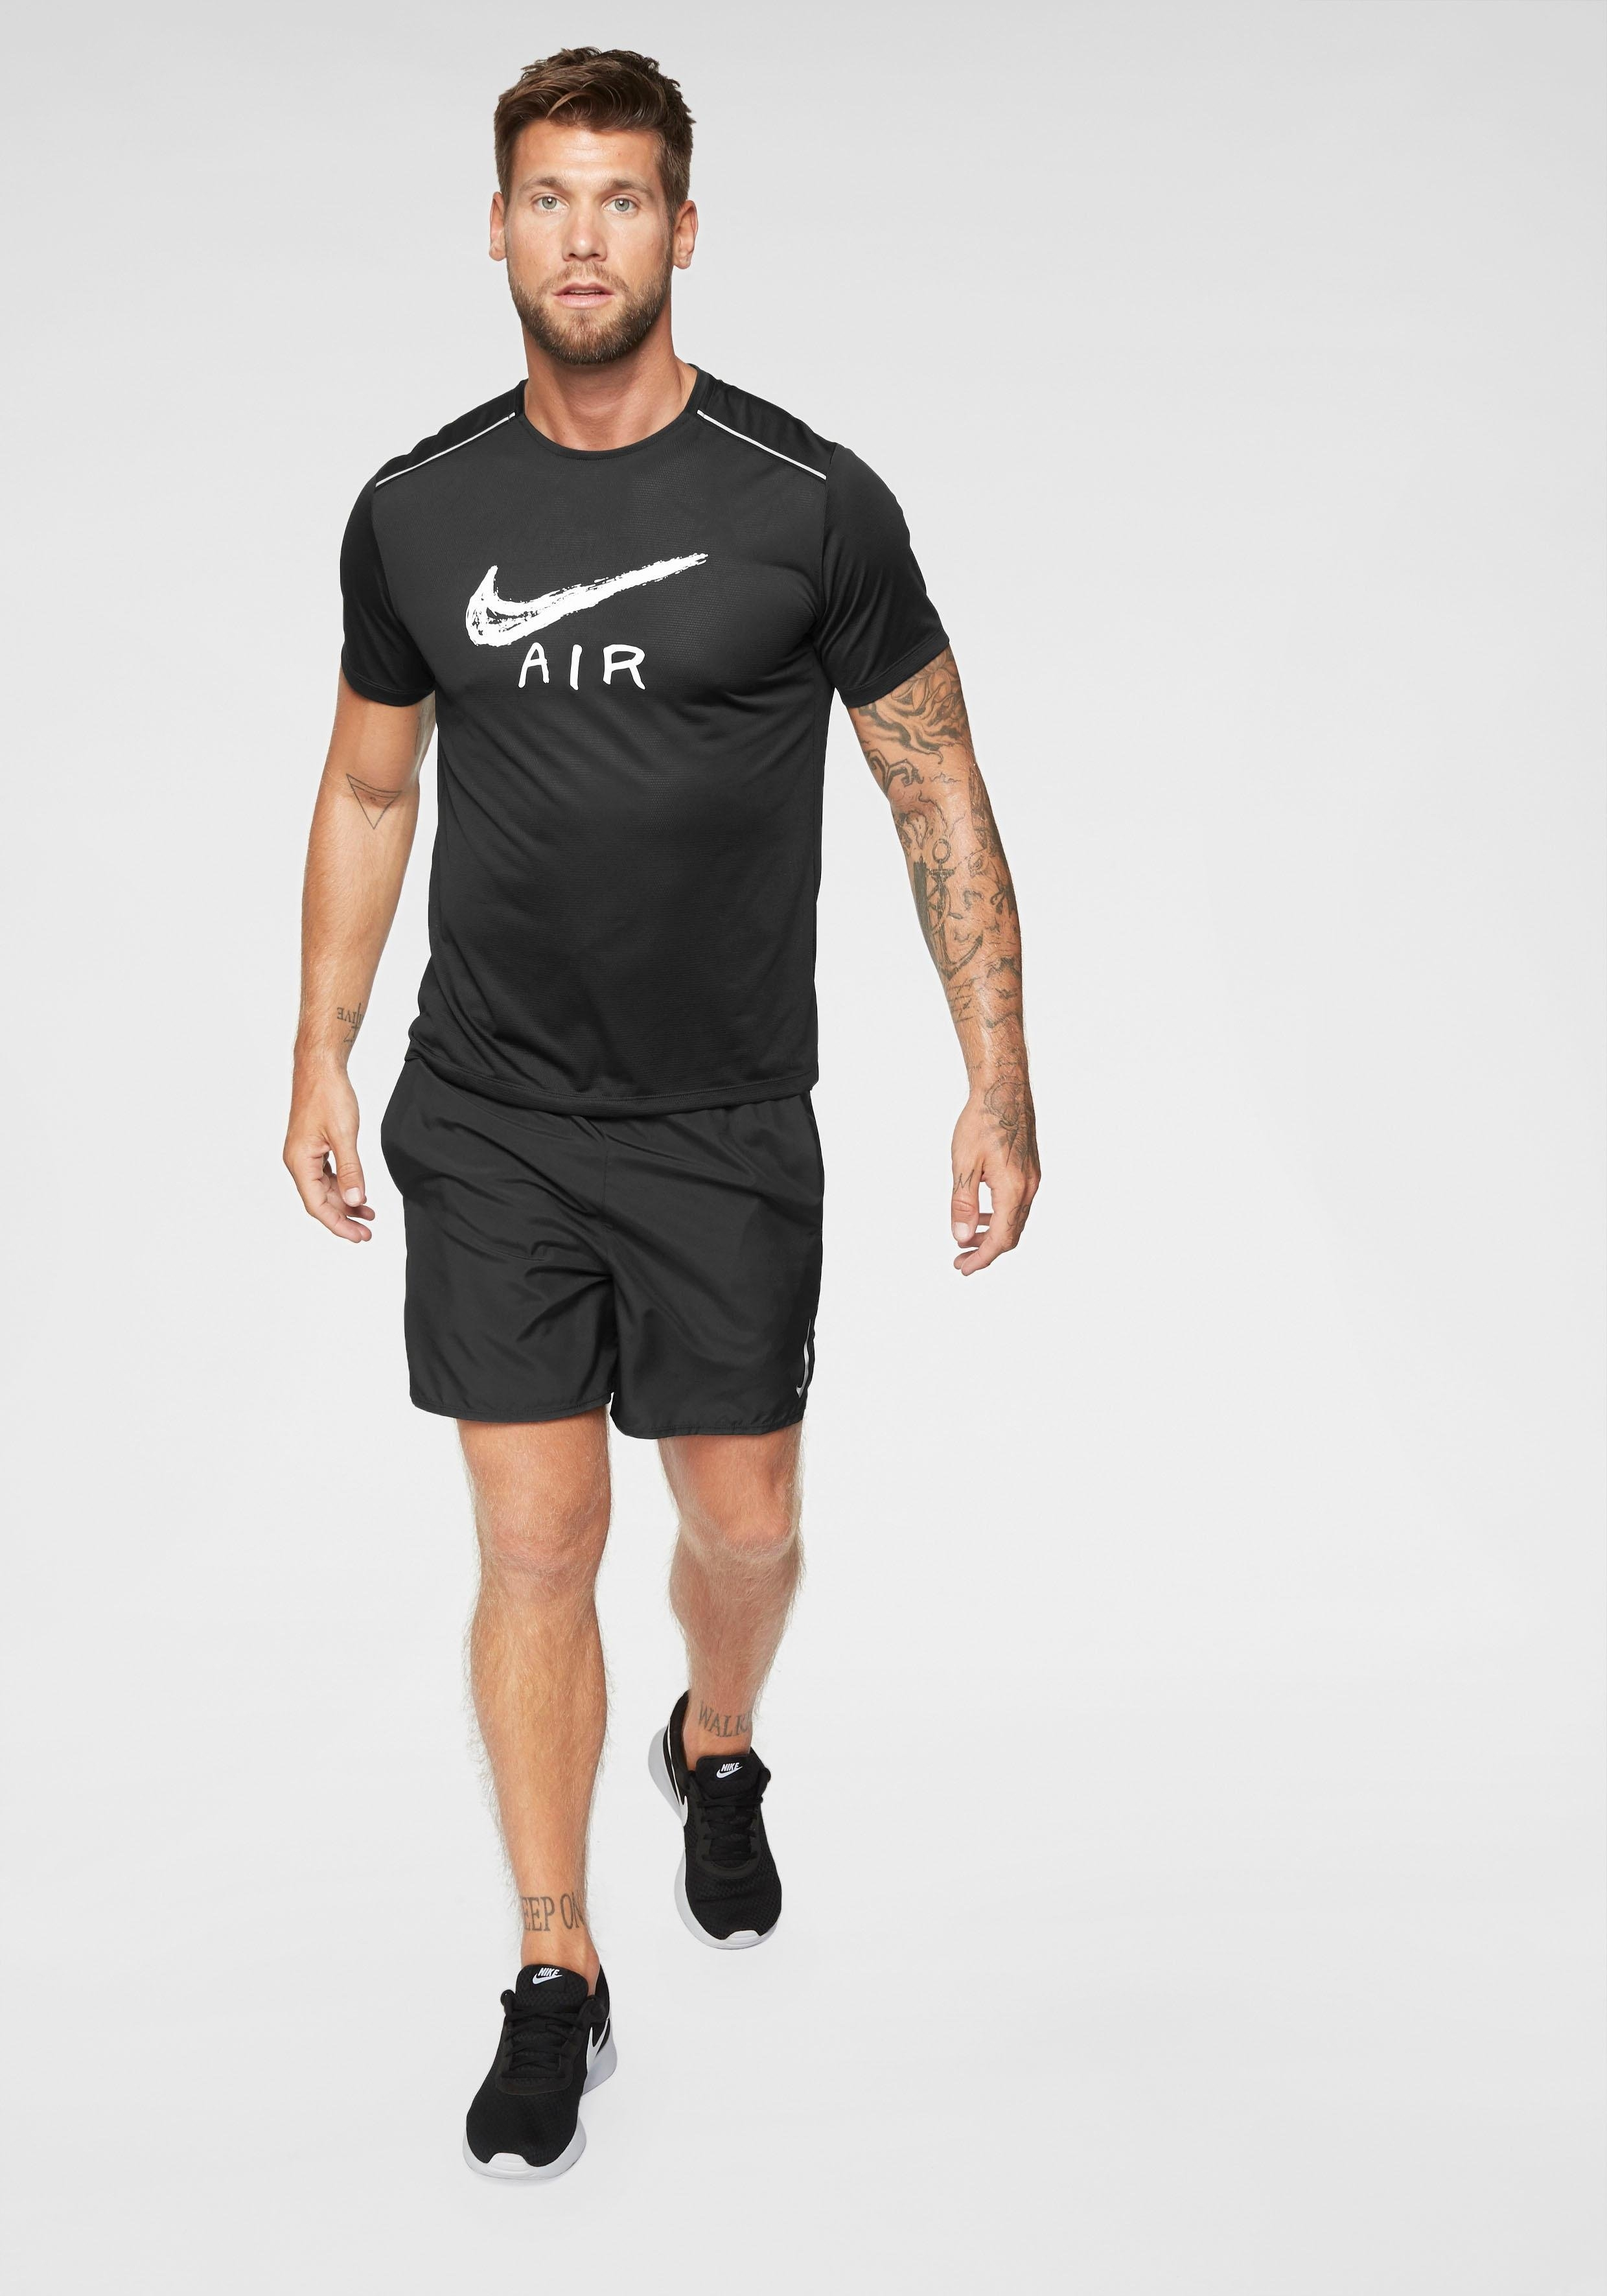 Short Bestellen Runningshortm Flx Bf Nike Stride Nk 7in Bij WEH9IDY2